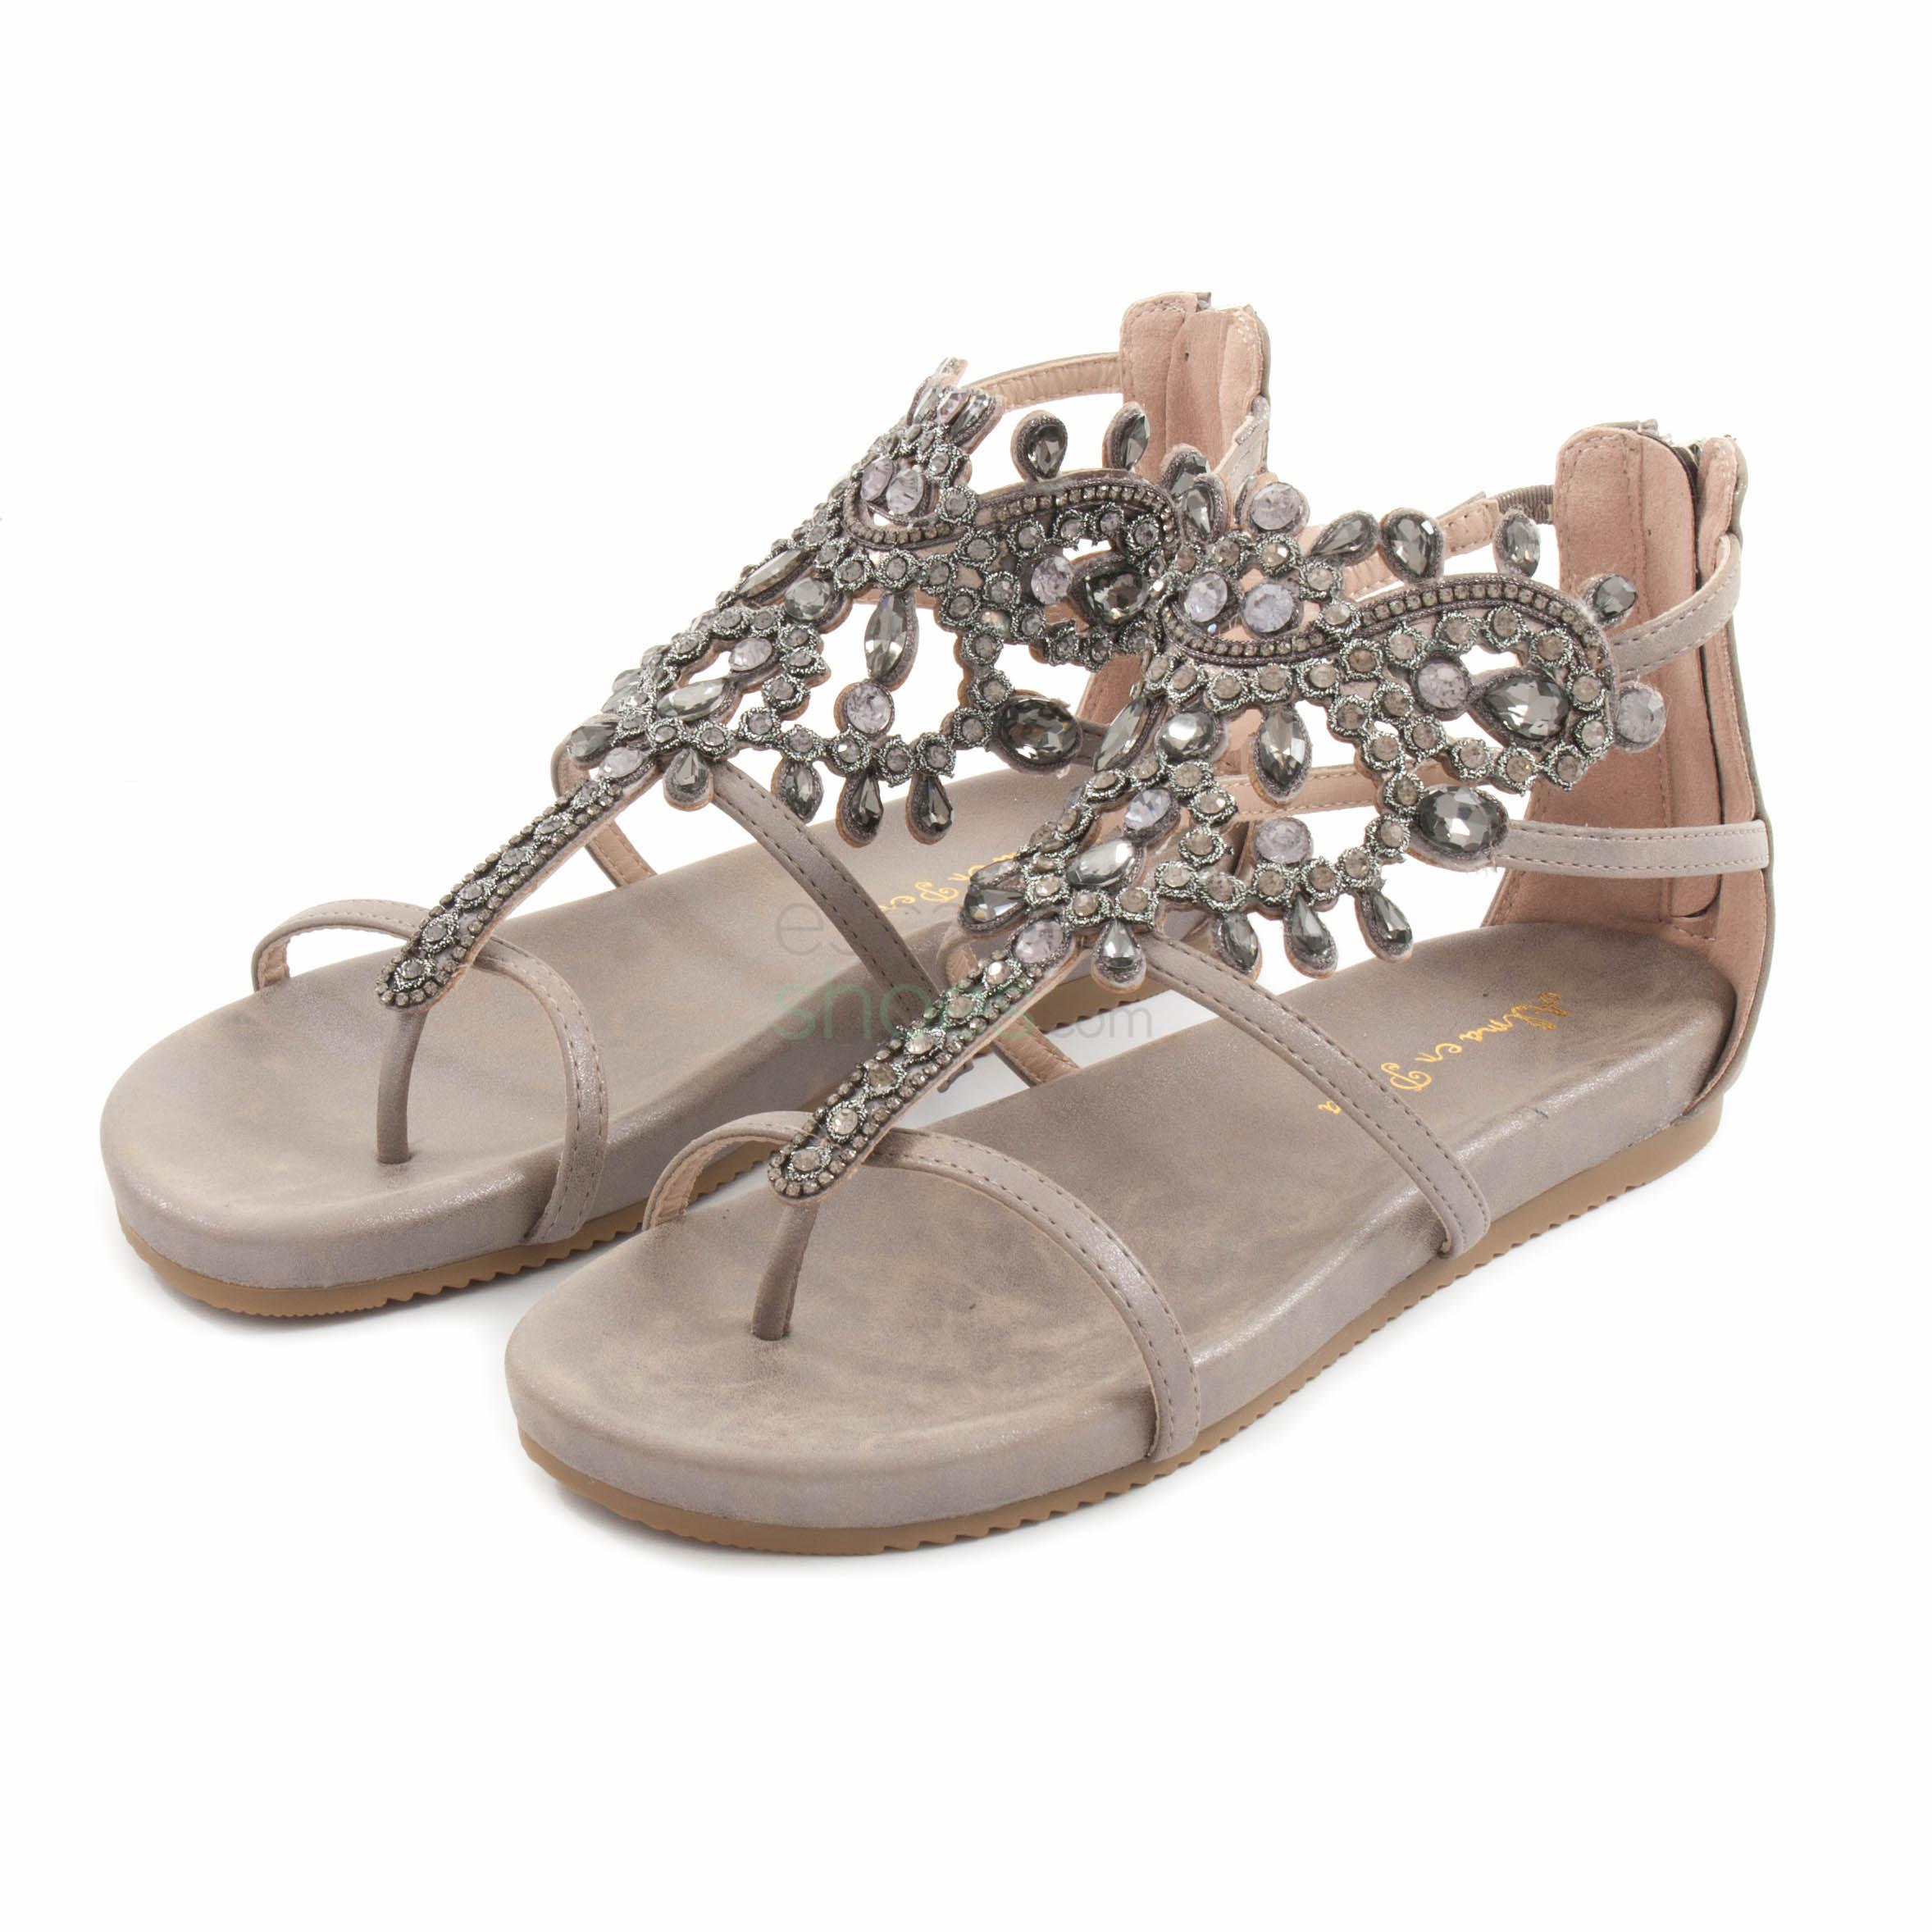 c2a370261d8 Buy your Sandals ALMA EN PENA V18450 Oporto Pewter here | Online ...